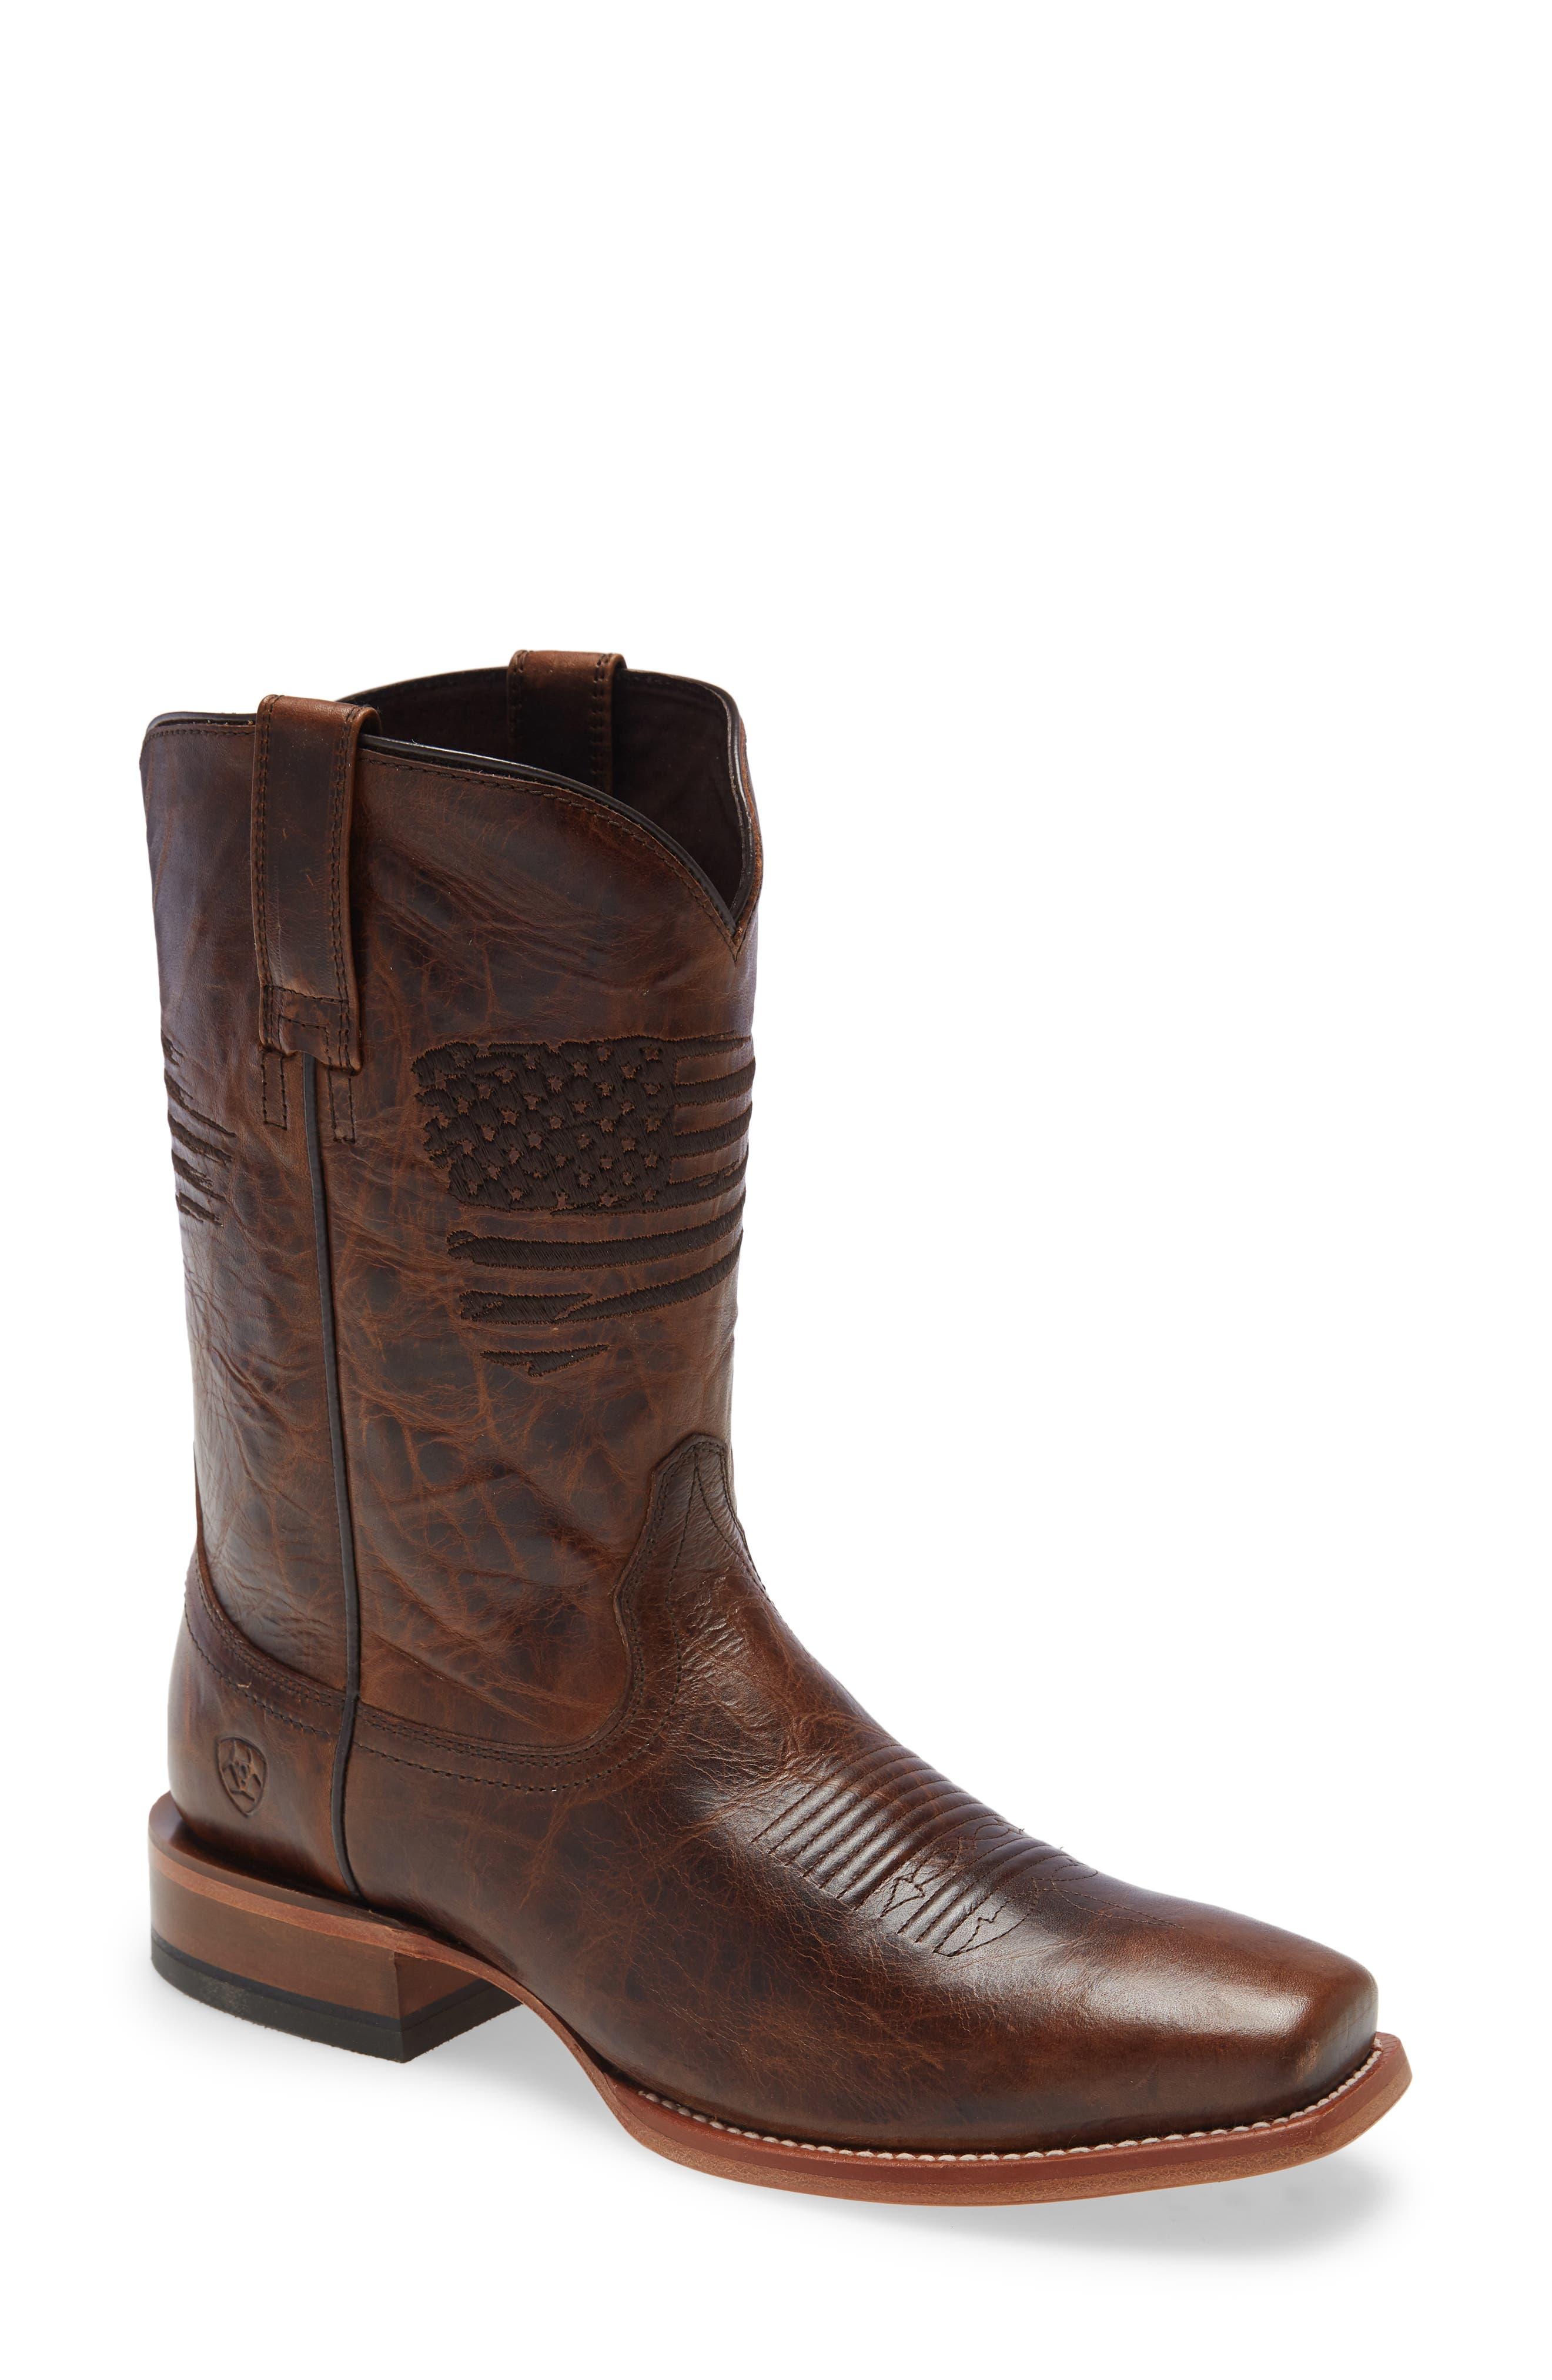 Circuit Patriot Square Toe Cowboy Boot